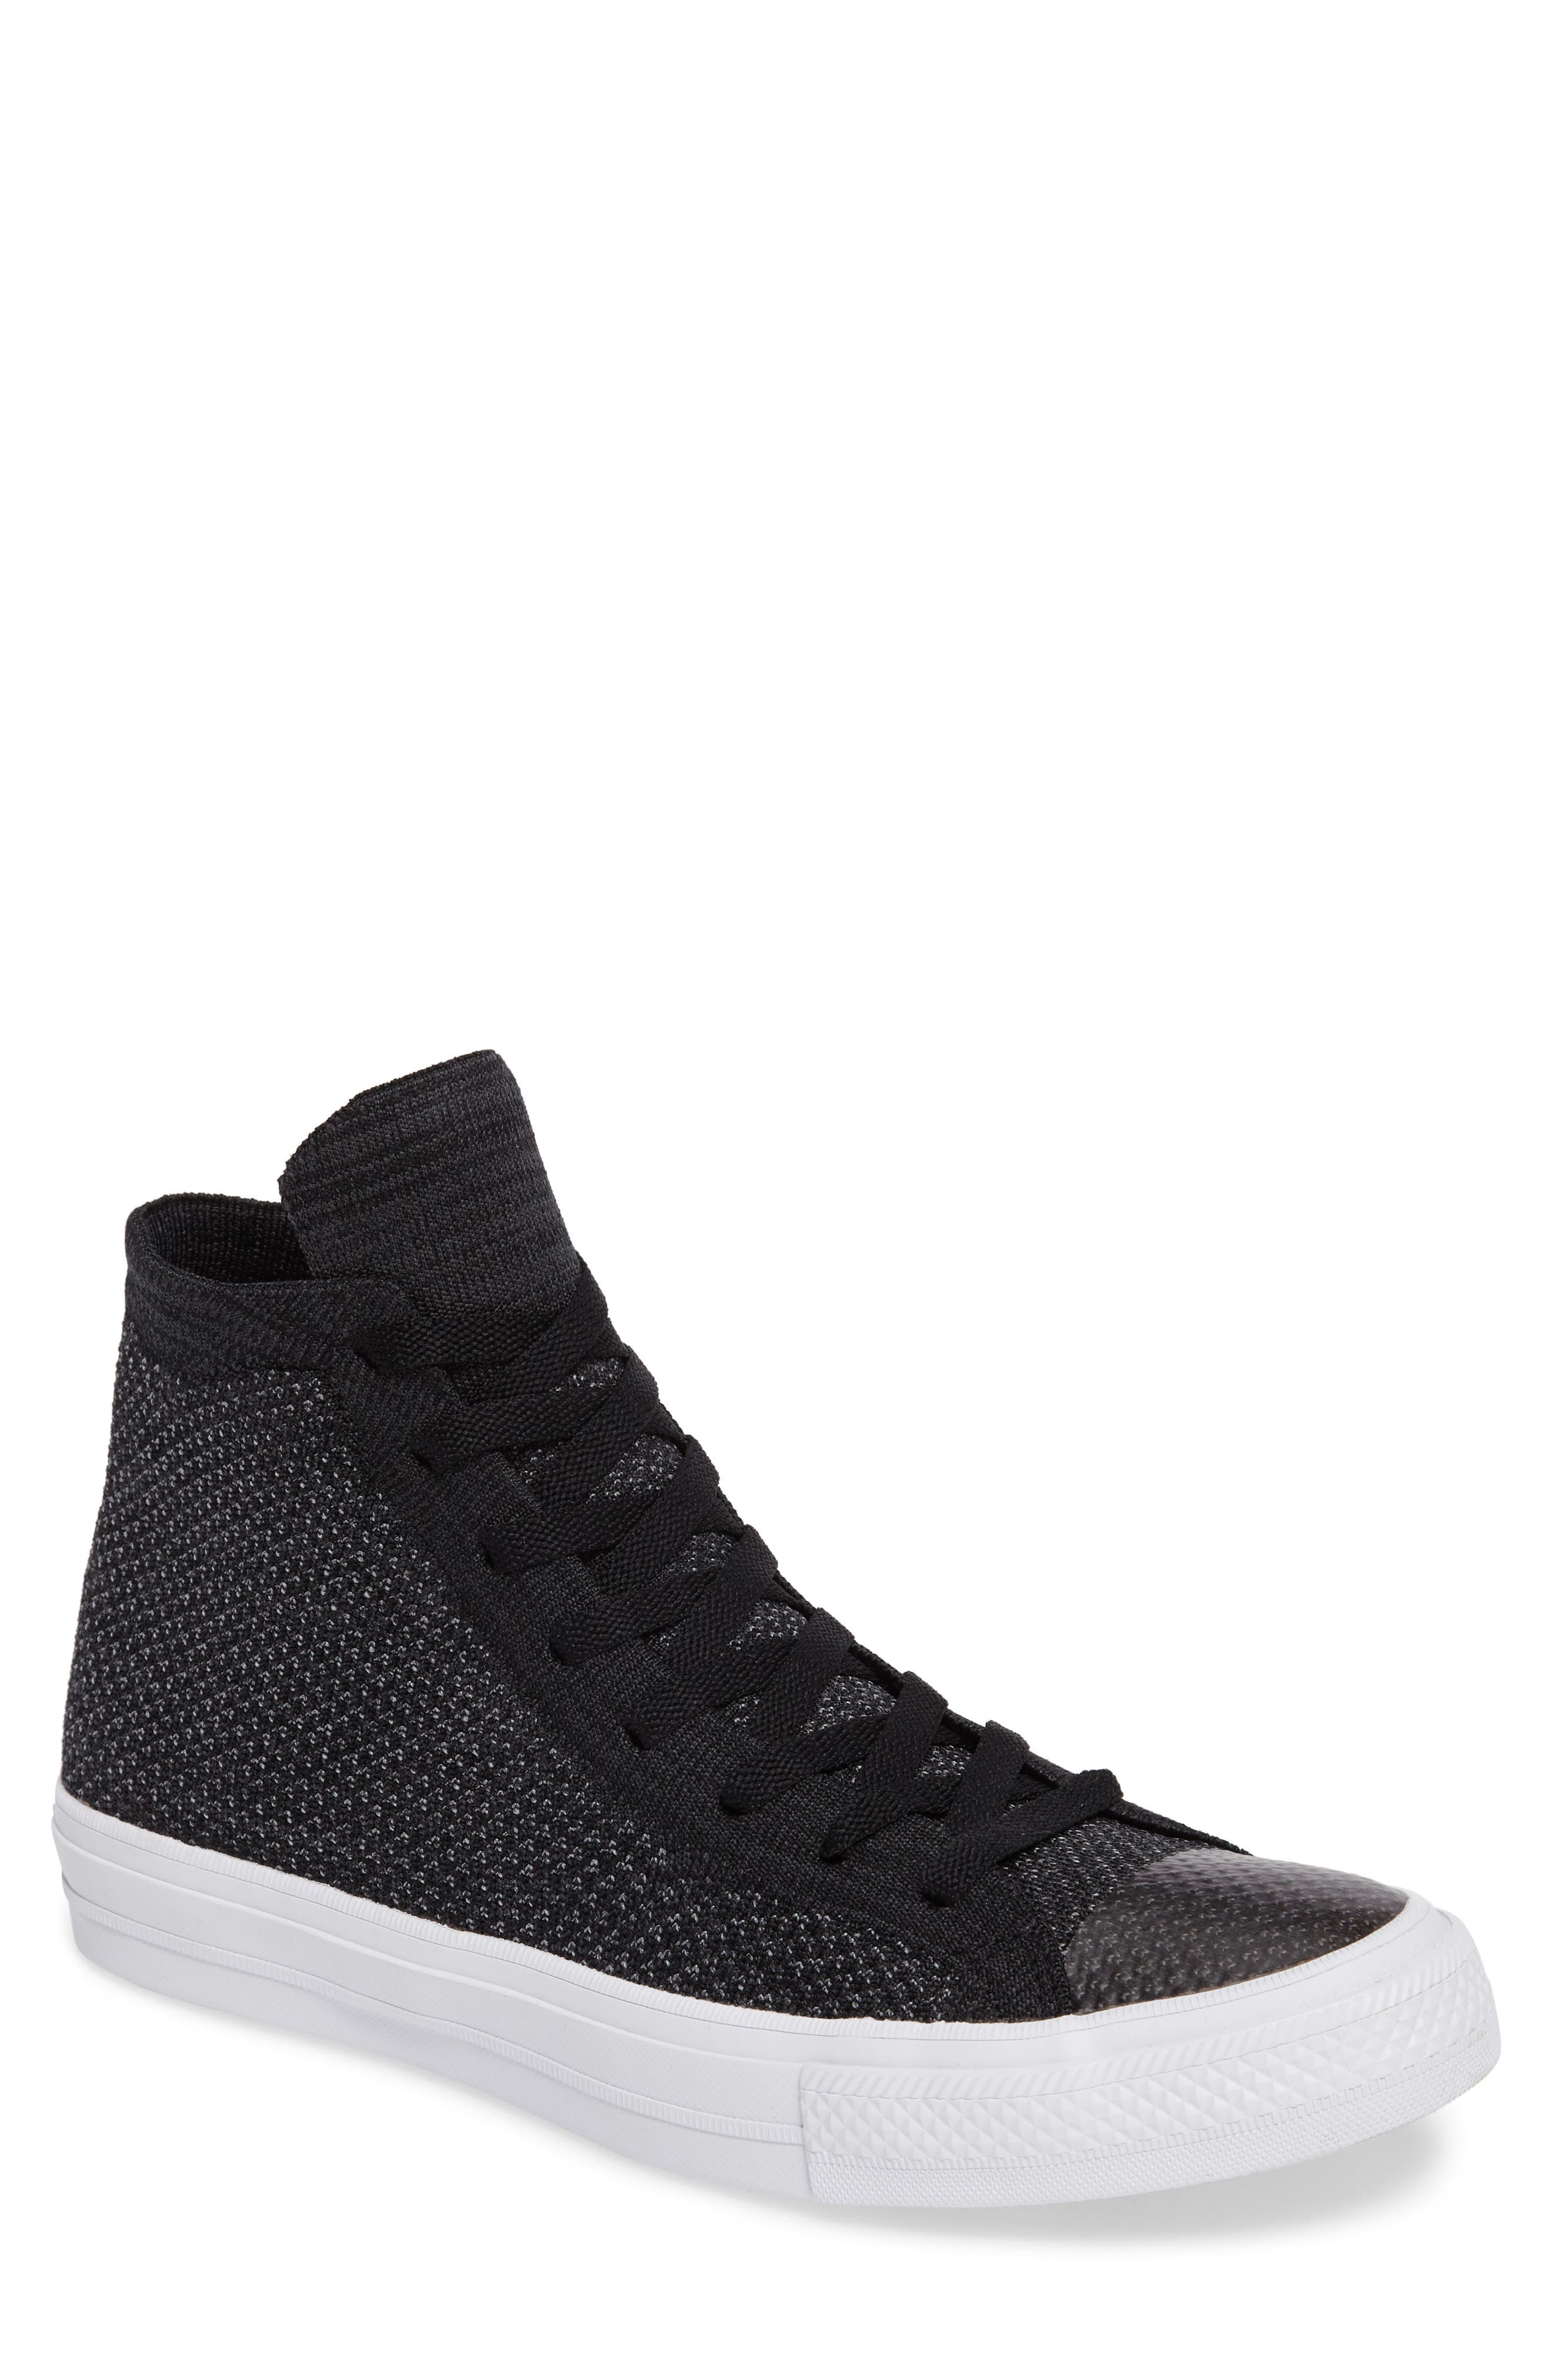 Converse Chuck Taylor® All Star® Flyknit Hi Sneaker (Men)